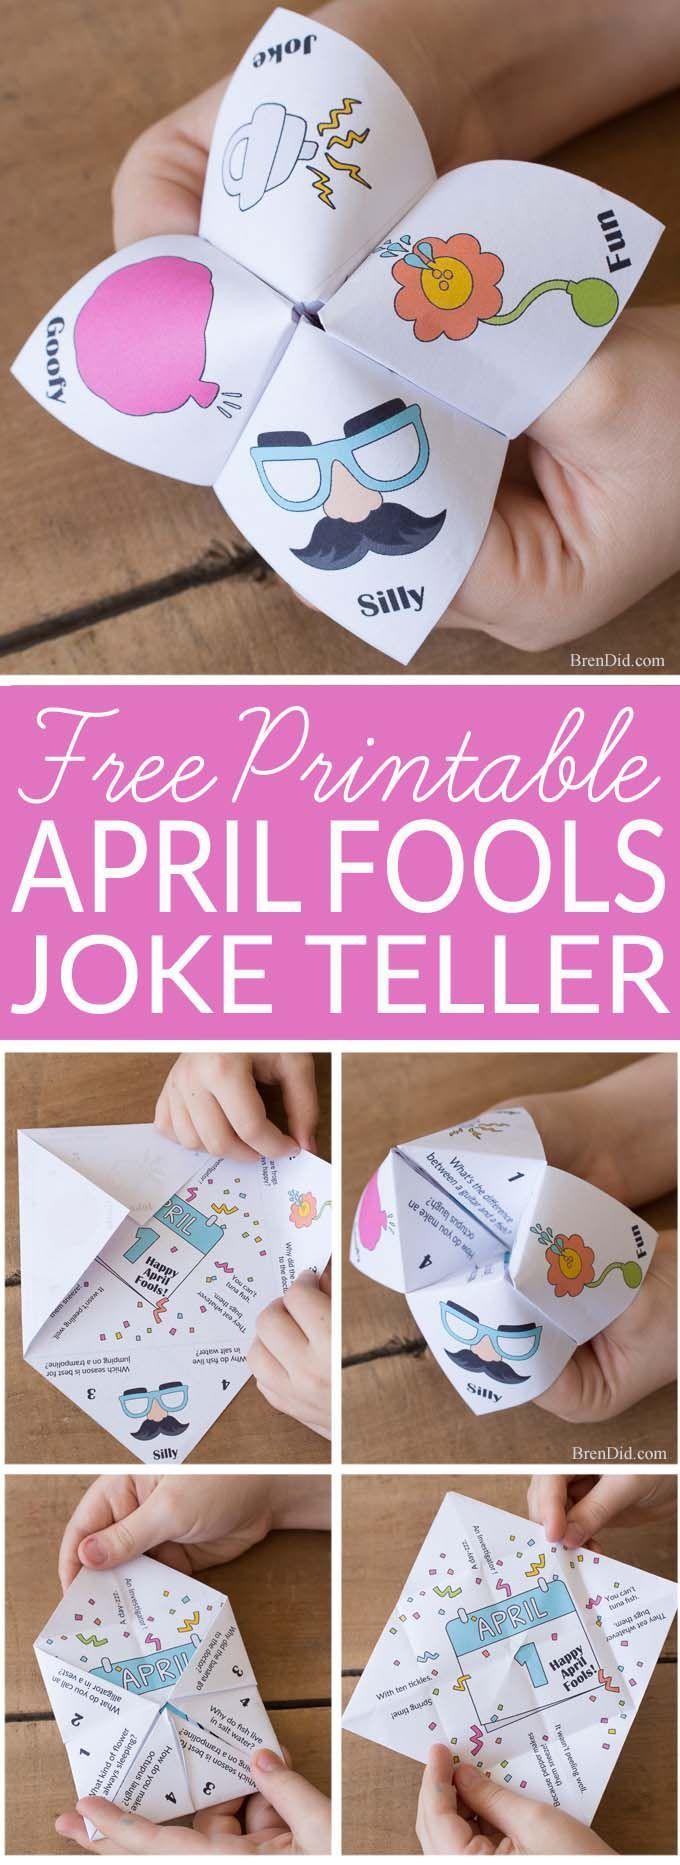 April Fools Jokes For Kids Mixed Up Joke Teller Prank Bren Did April Fools Joke Pranks For Kids April Crafts